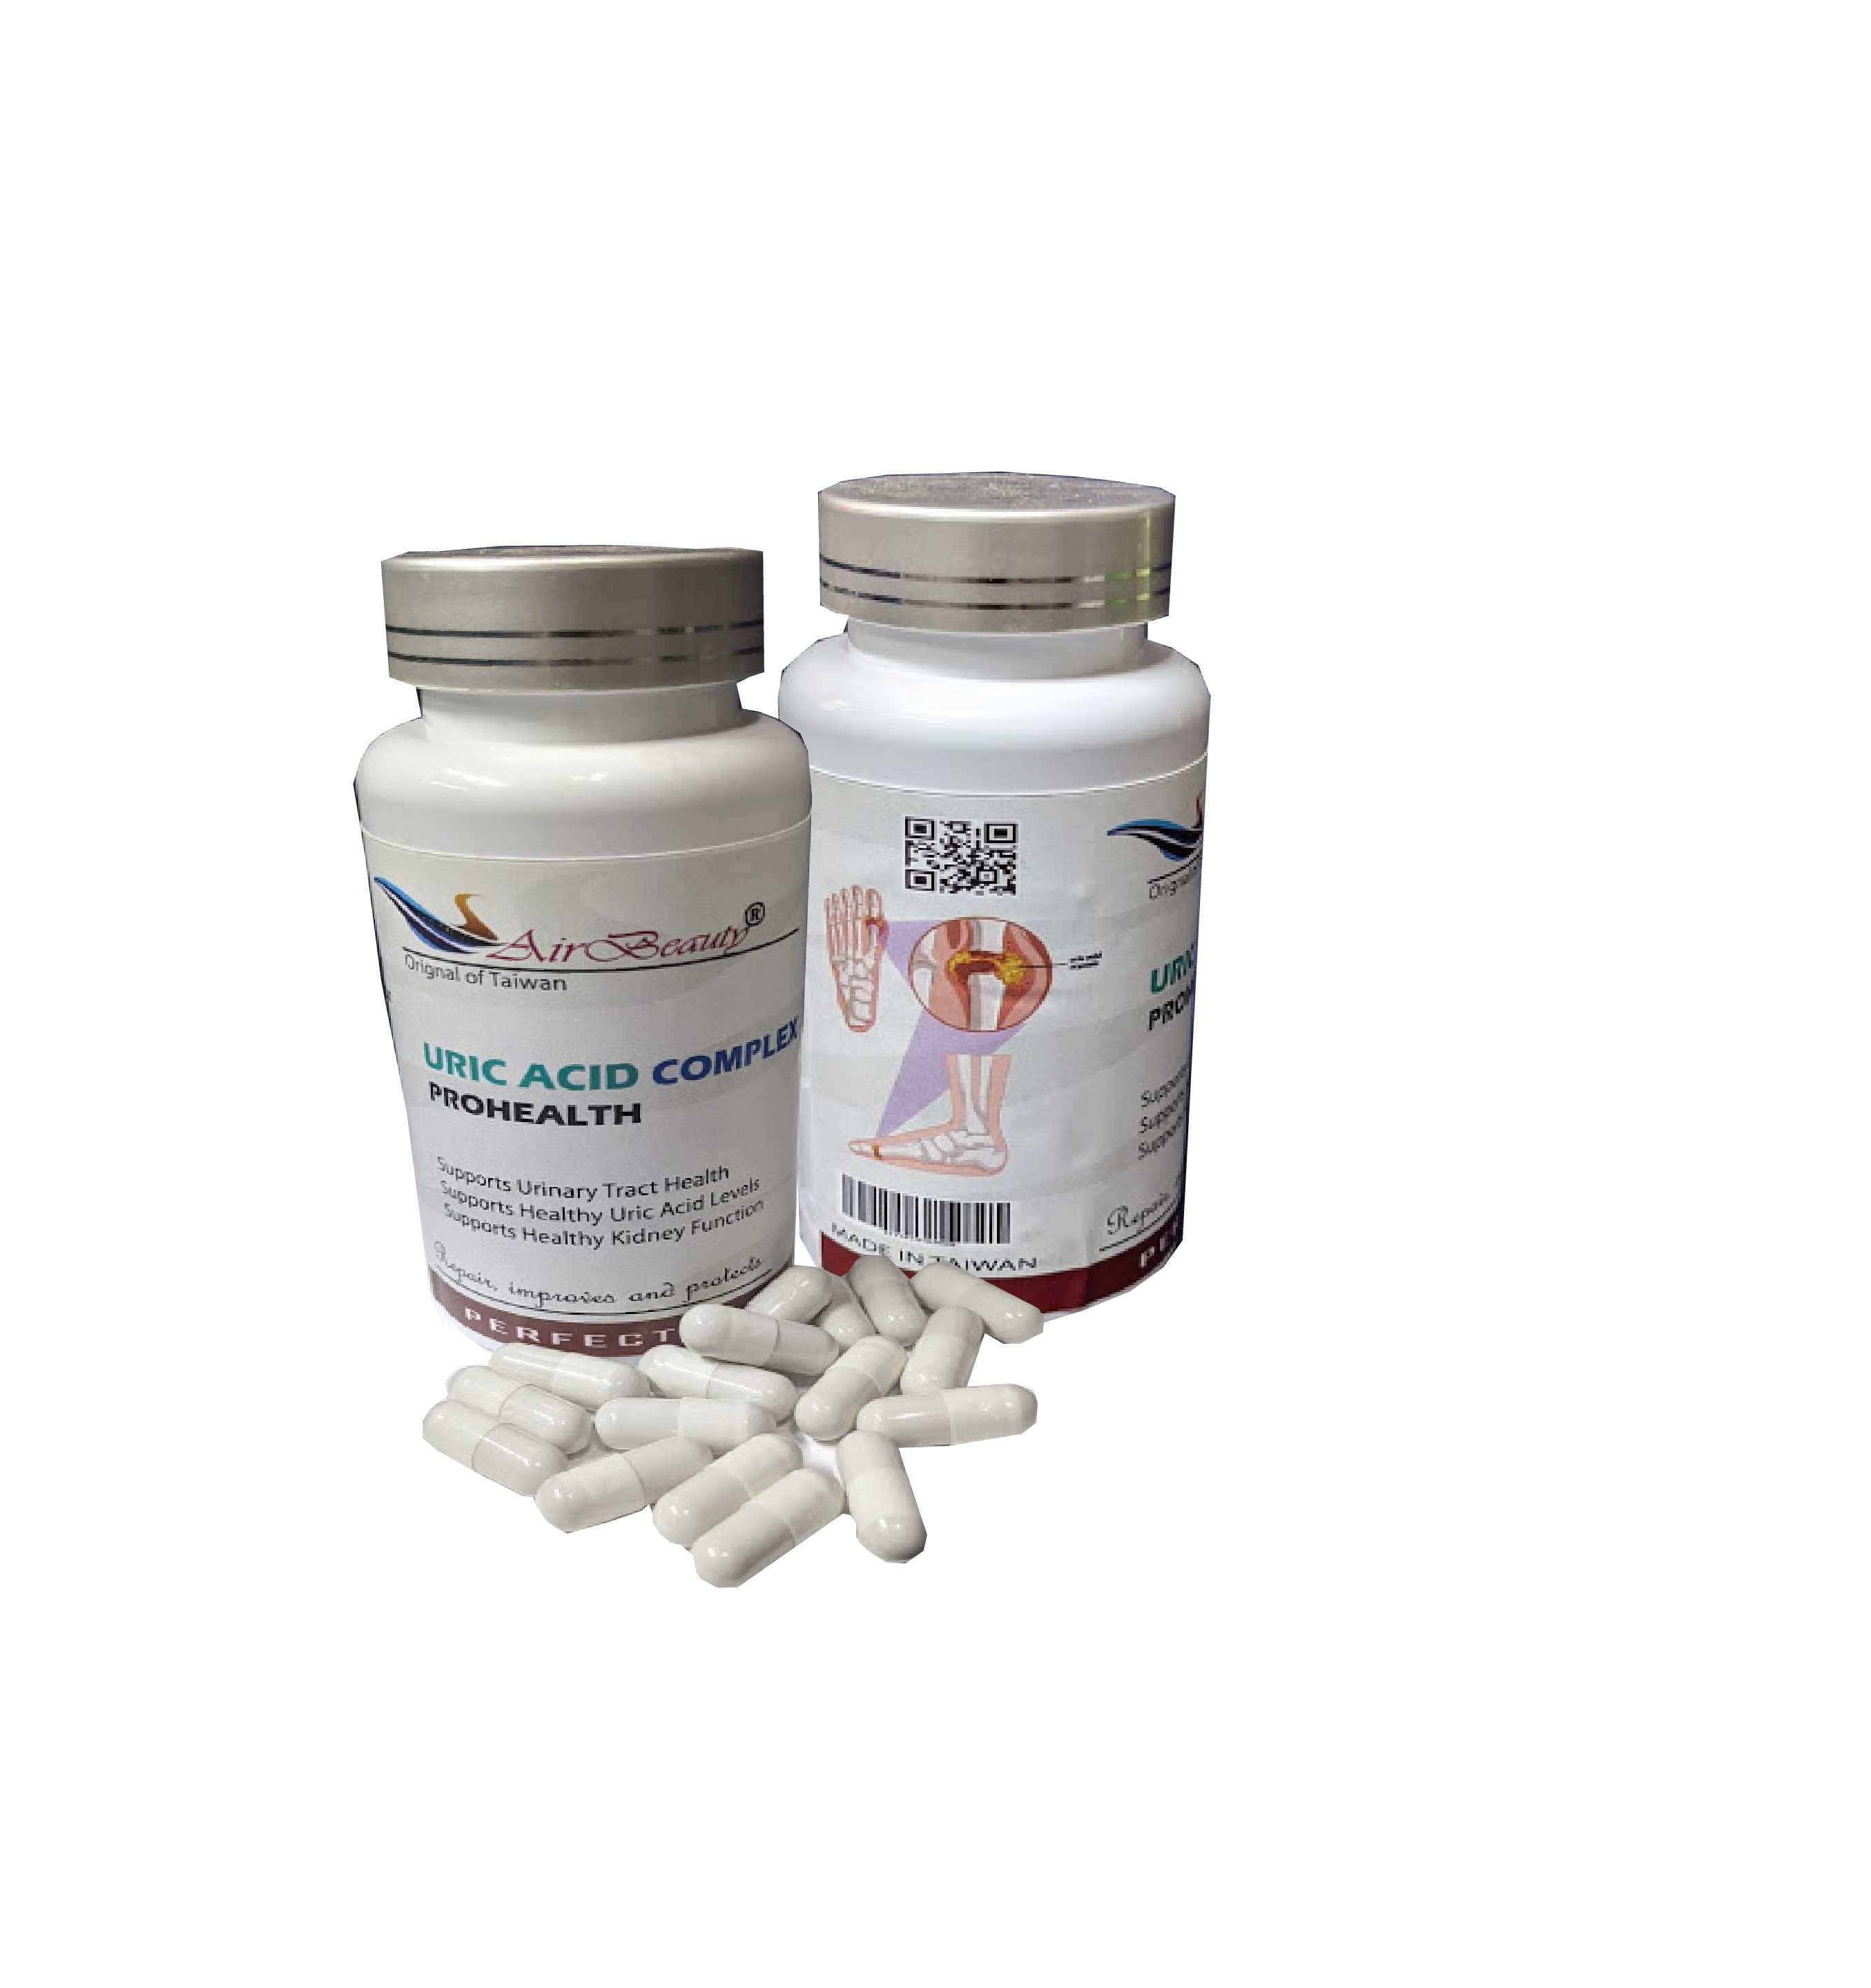 Dietary Fiber Food Peptide Capsules-Uric Acid Complex Capsules for gout